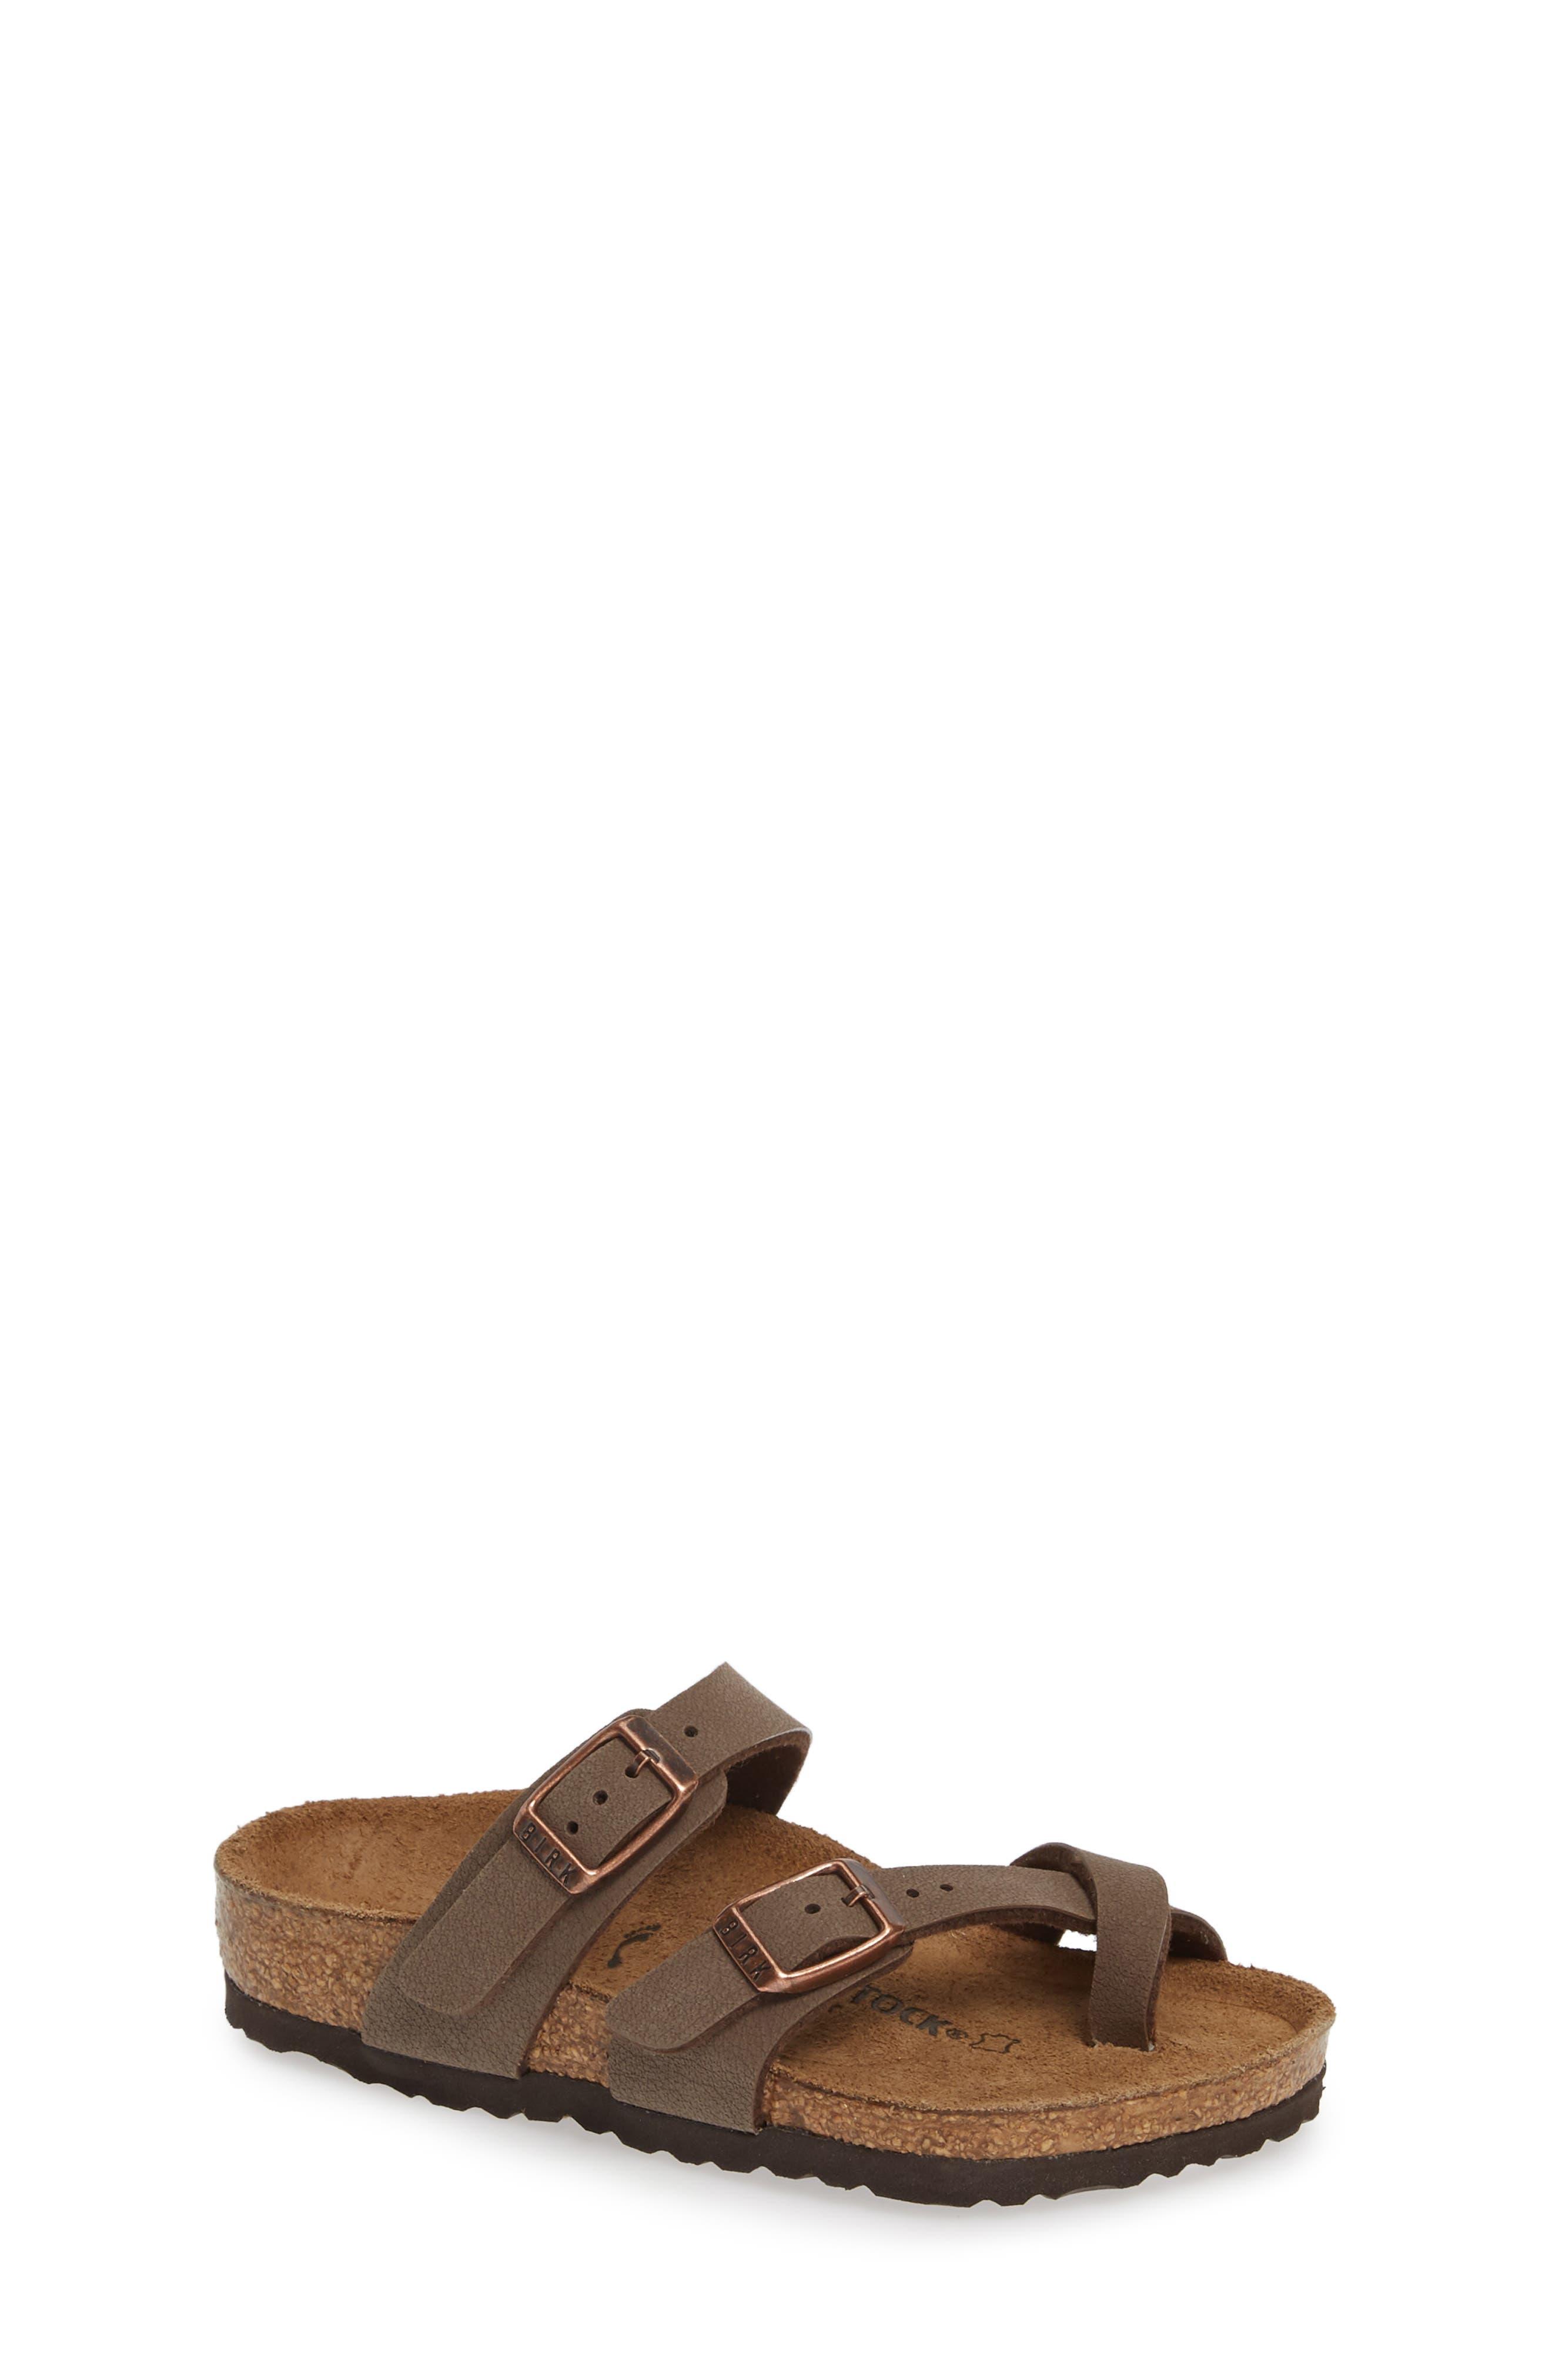 Mayari Birko-Flor<sup>™</sup> Sandal, Main, color, MOCHA